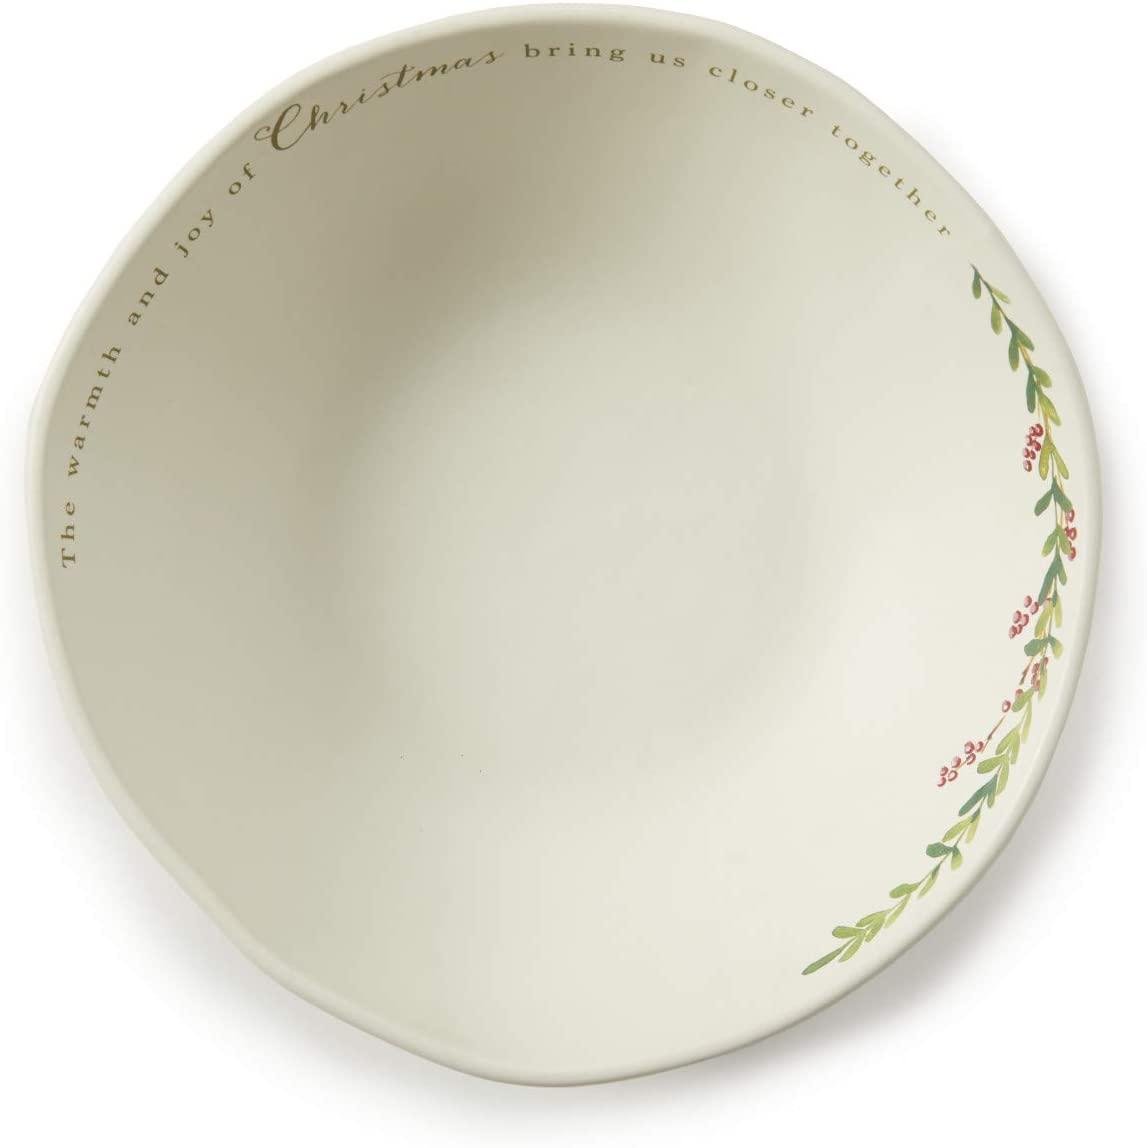 Warmth Greenery Glossy White 11 x 11 Ceramic Stoneware Holiday Serving Bowl